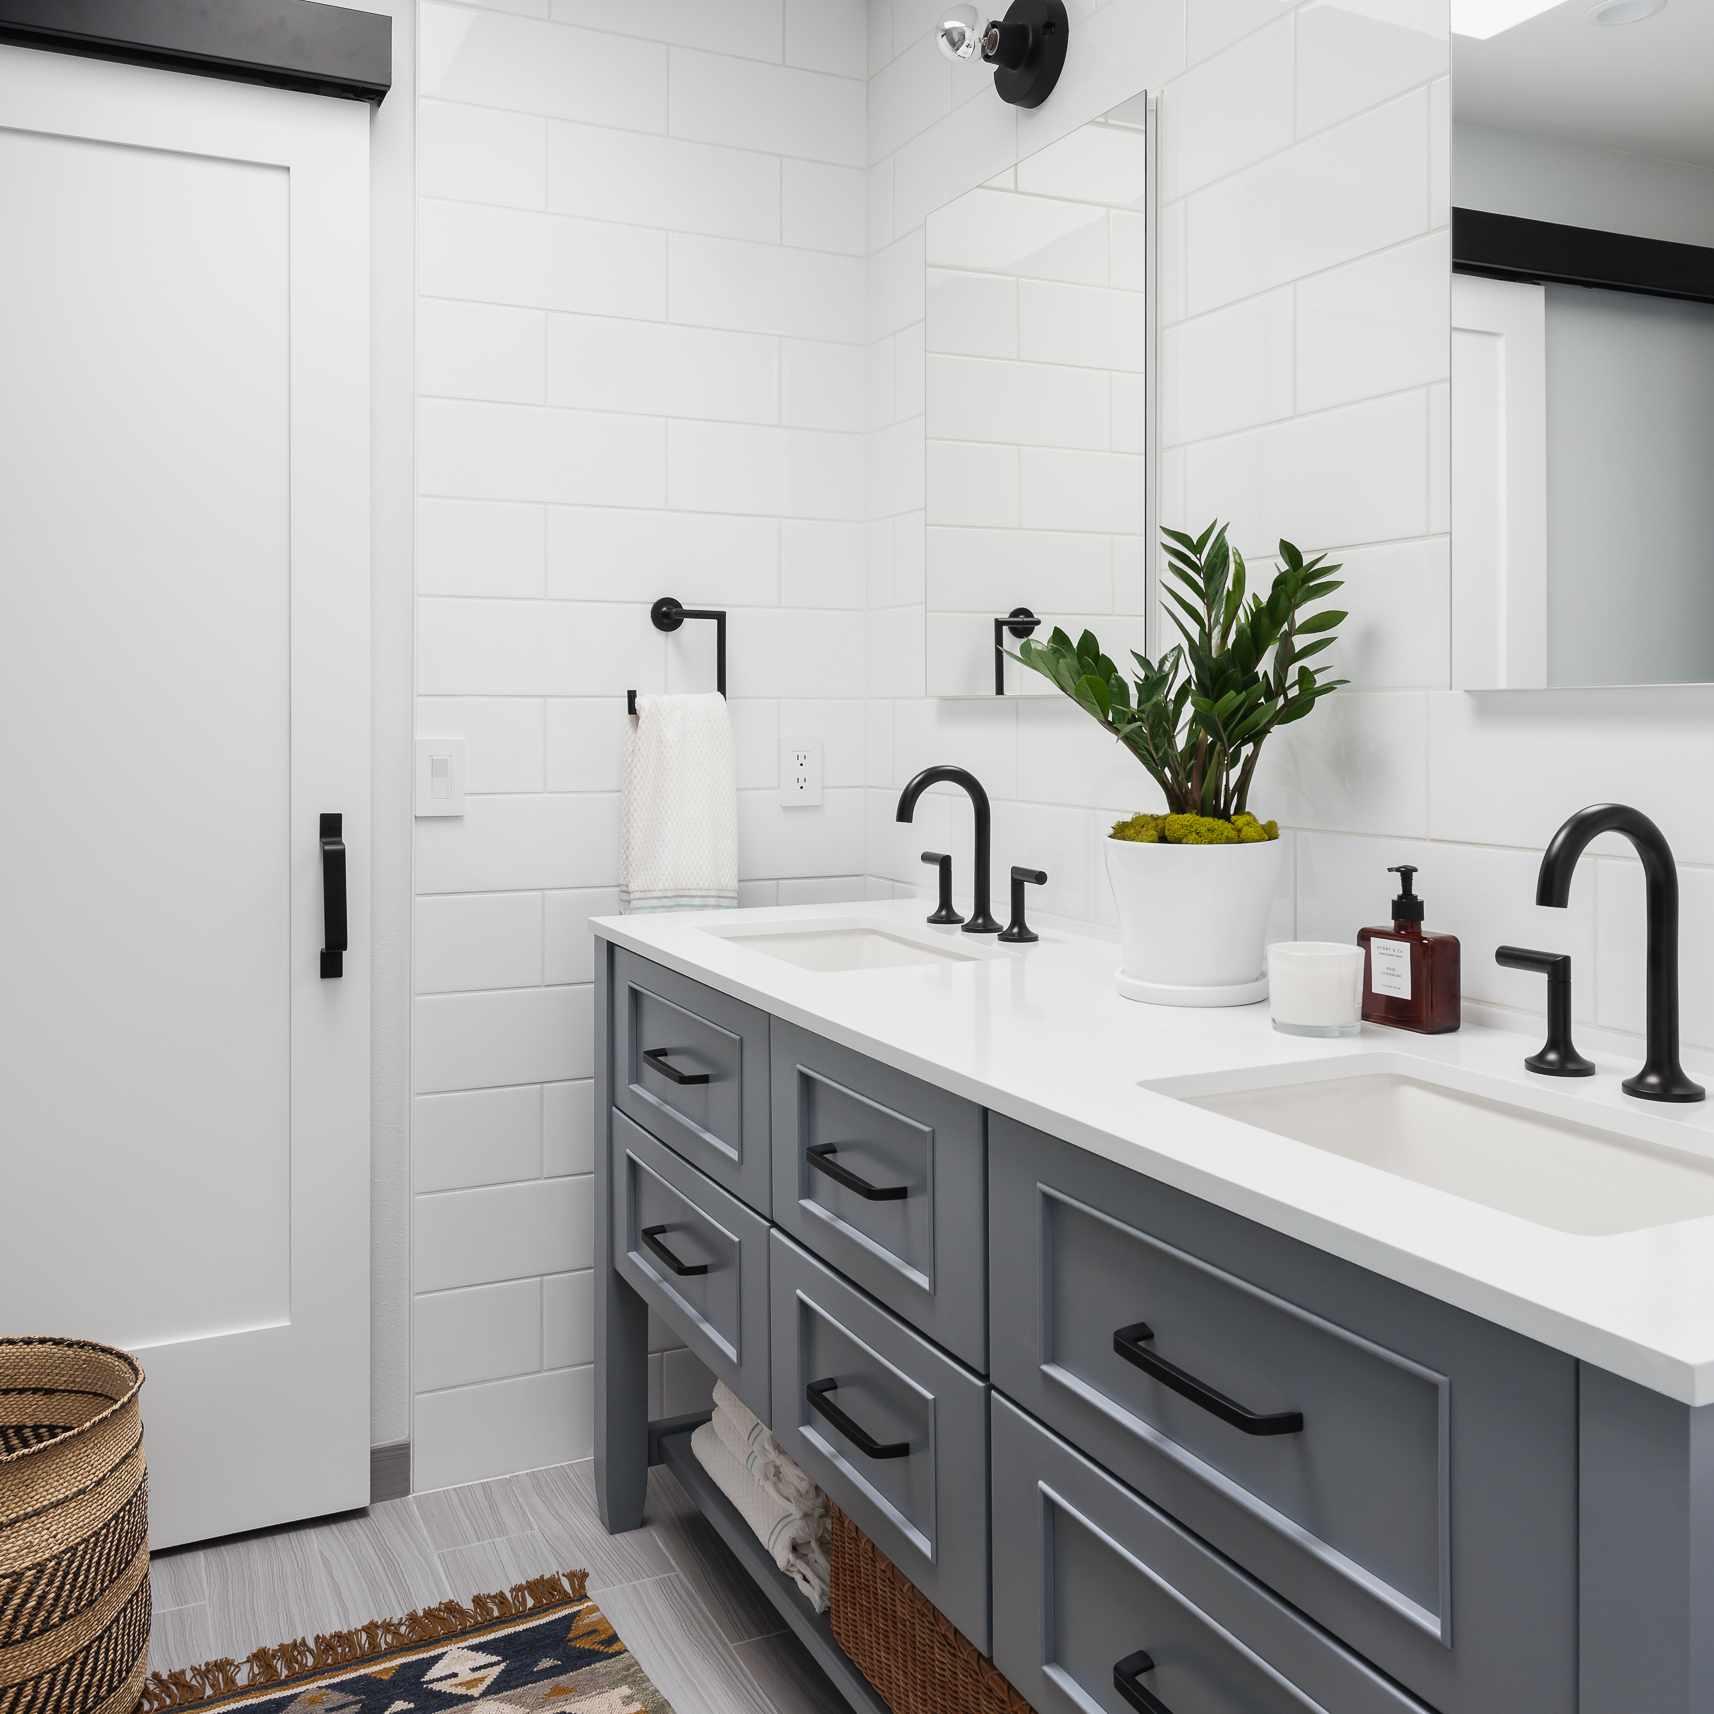 Bathroom following the 60-30-10 rule